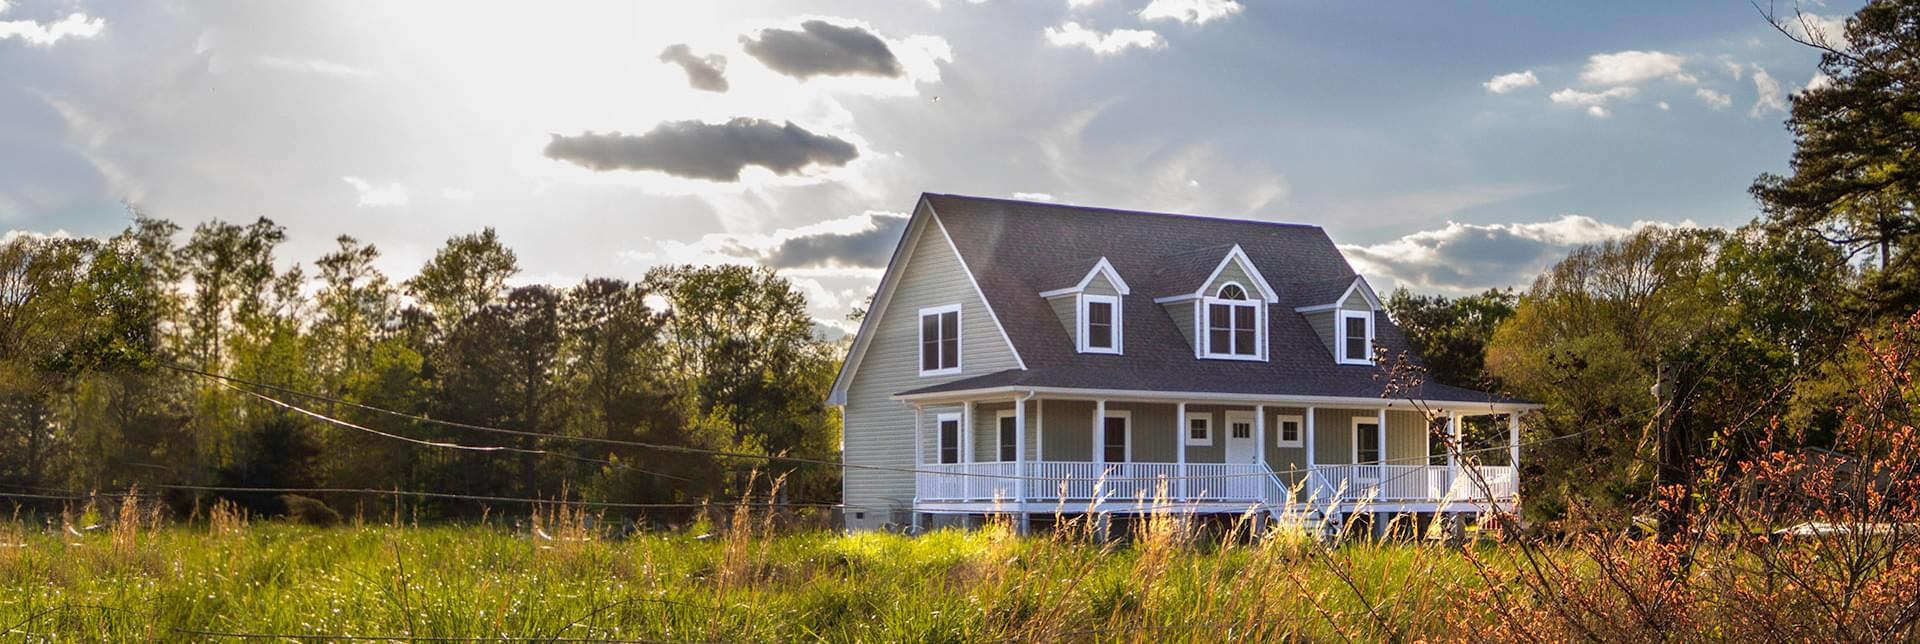 New Homes in Louisa County VA